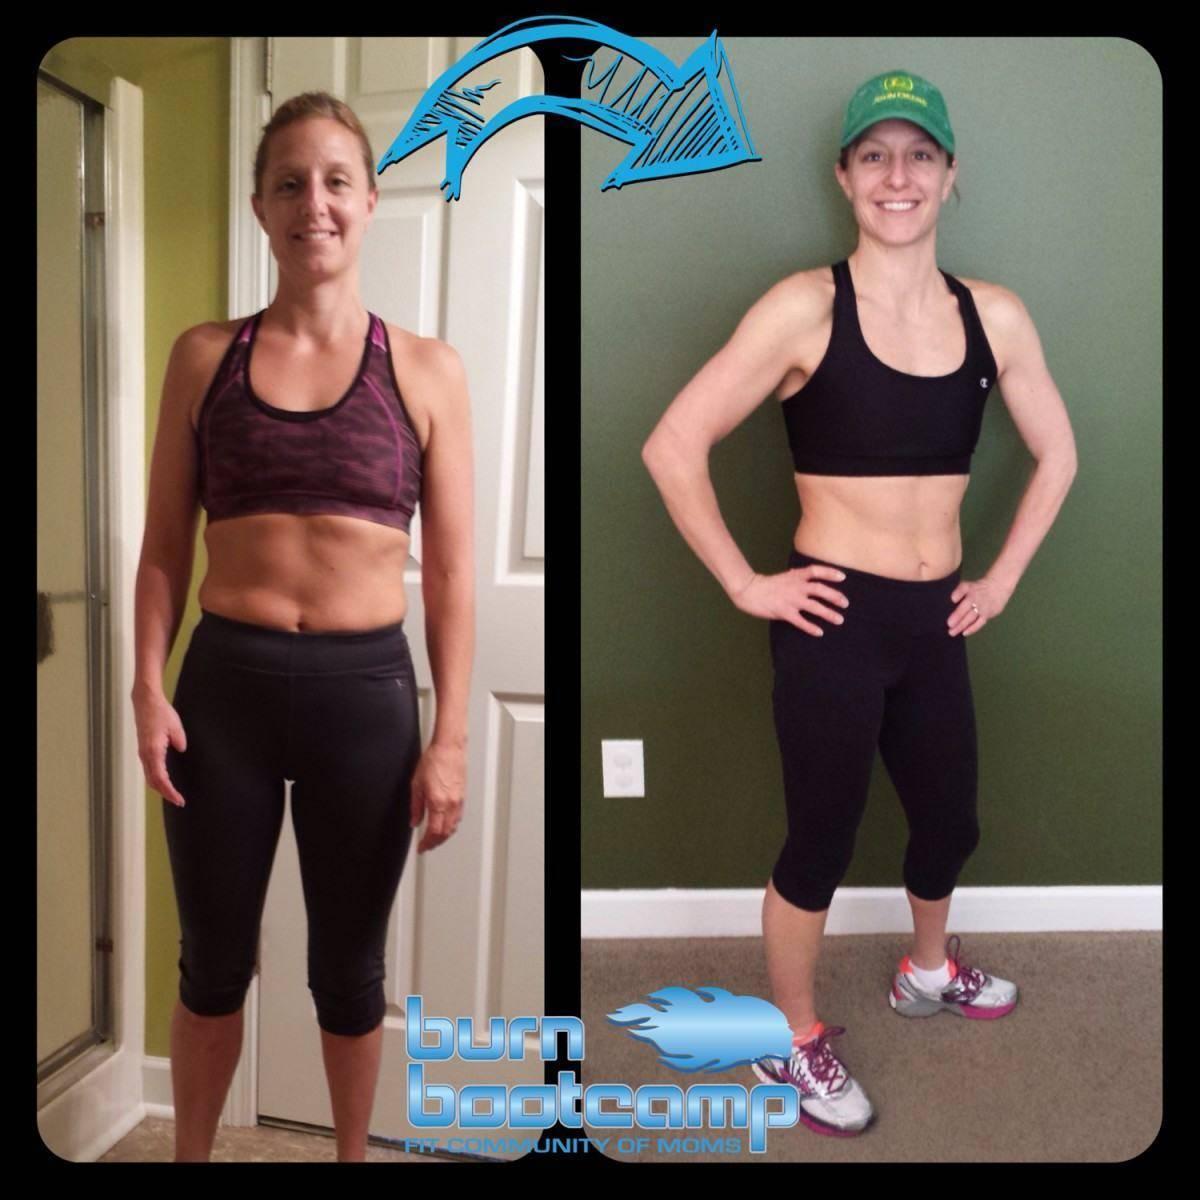 Phyllis Jones Burn Boot Camp Denver Weight Loss Story